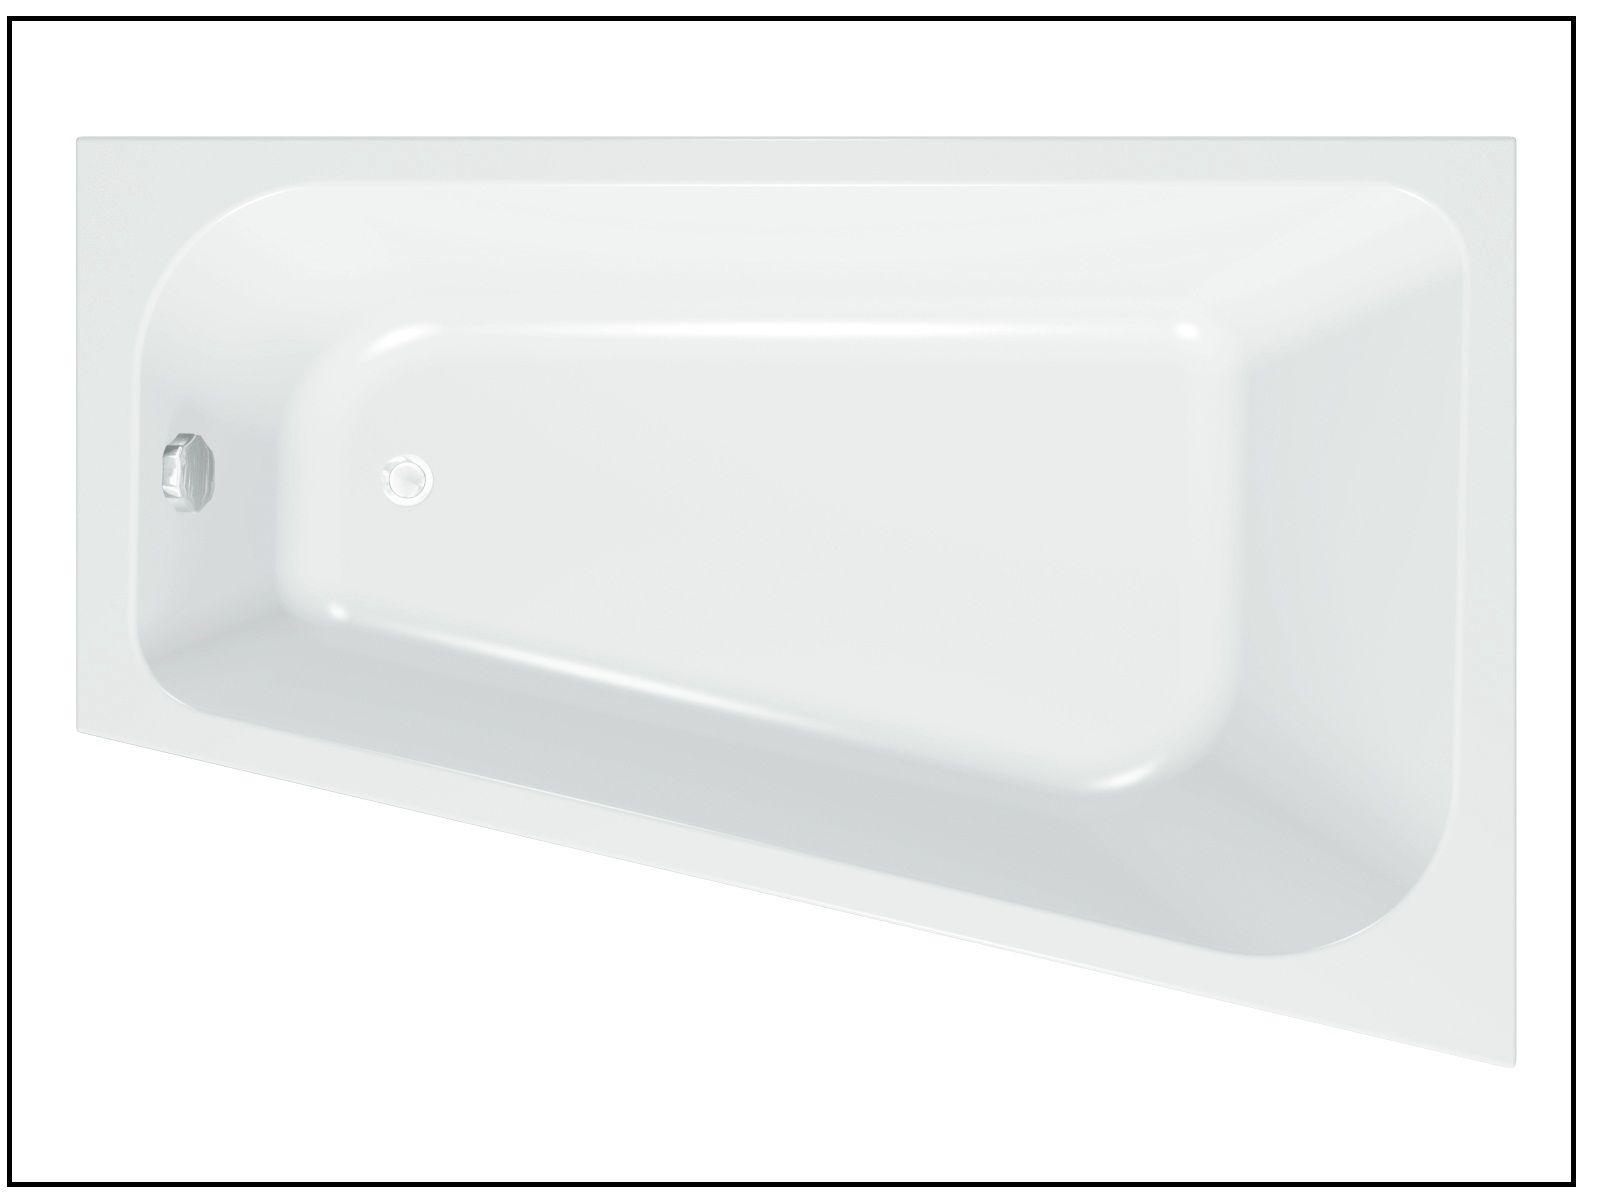 design badewanne eckbadewanne mara 170 x 110 cm inkl f en frei. Black Bedroom Furniture Sets. Home Design Ideas